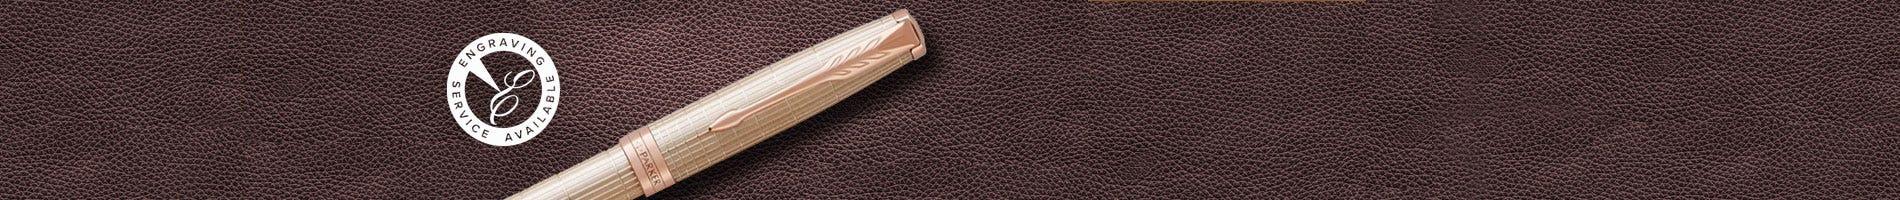 Parker Sonnet pen set stainless steel gold trim